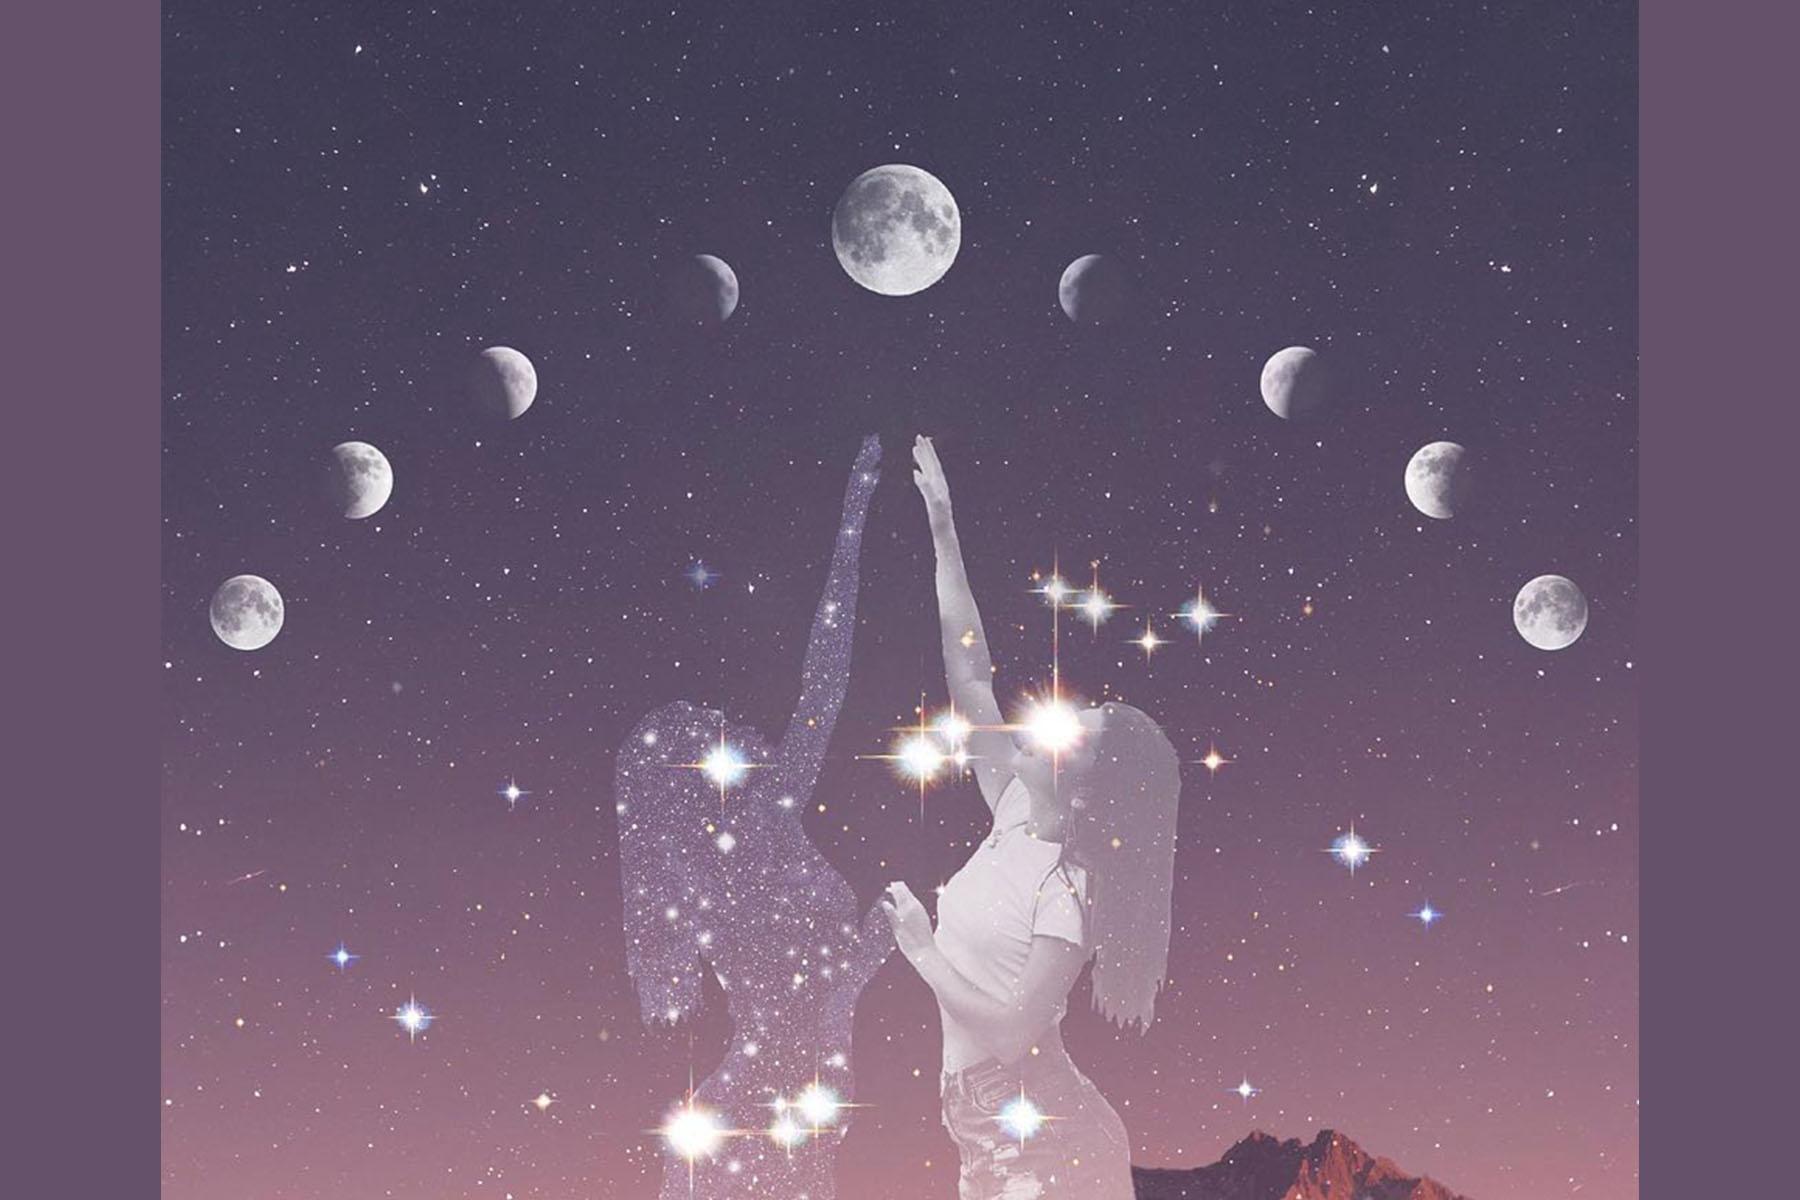 December 2019 Gemini Full Moon Horoscopes